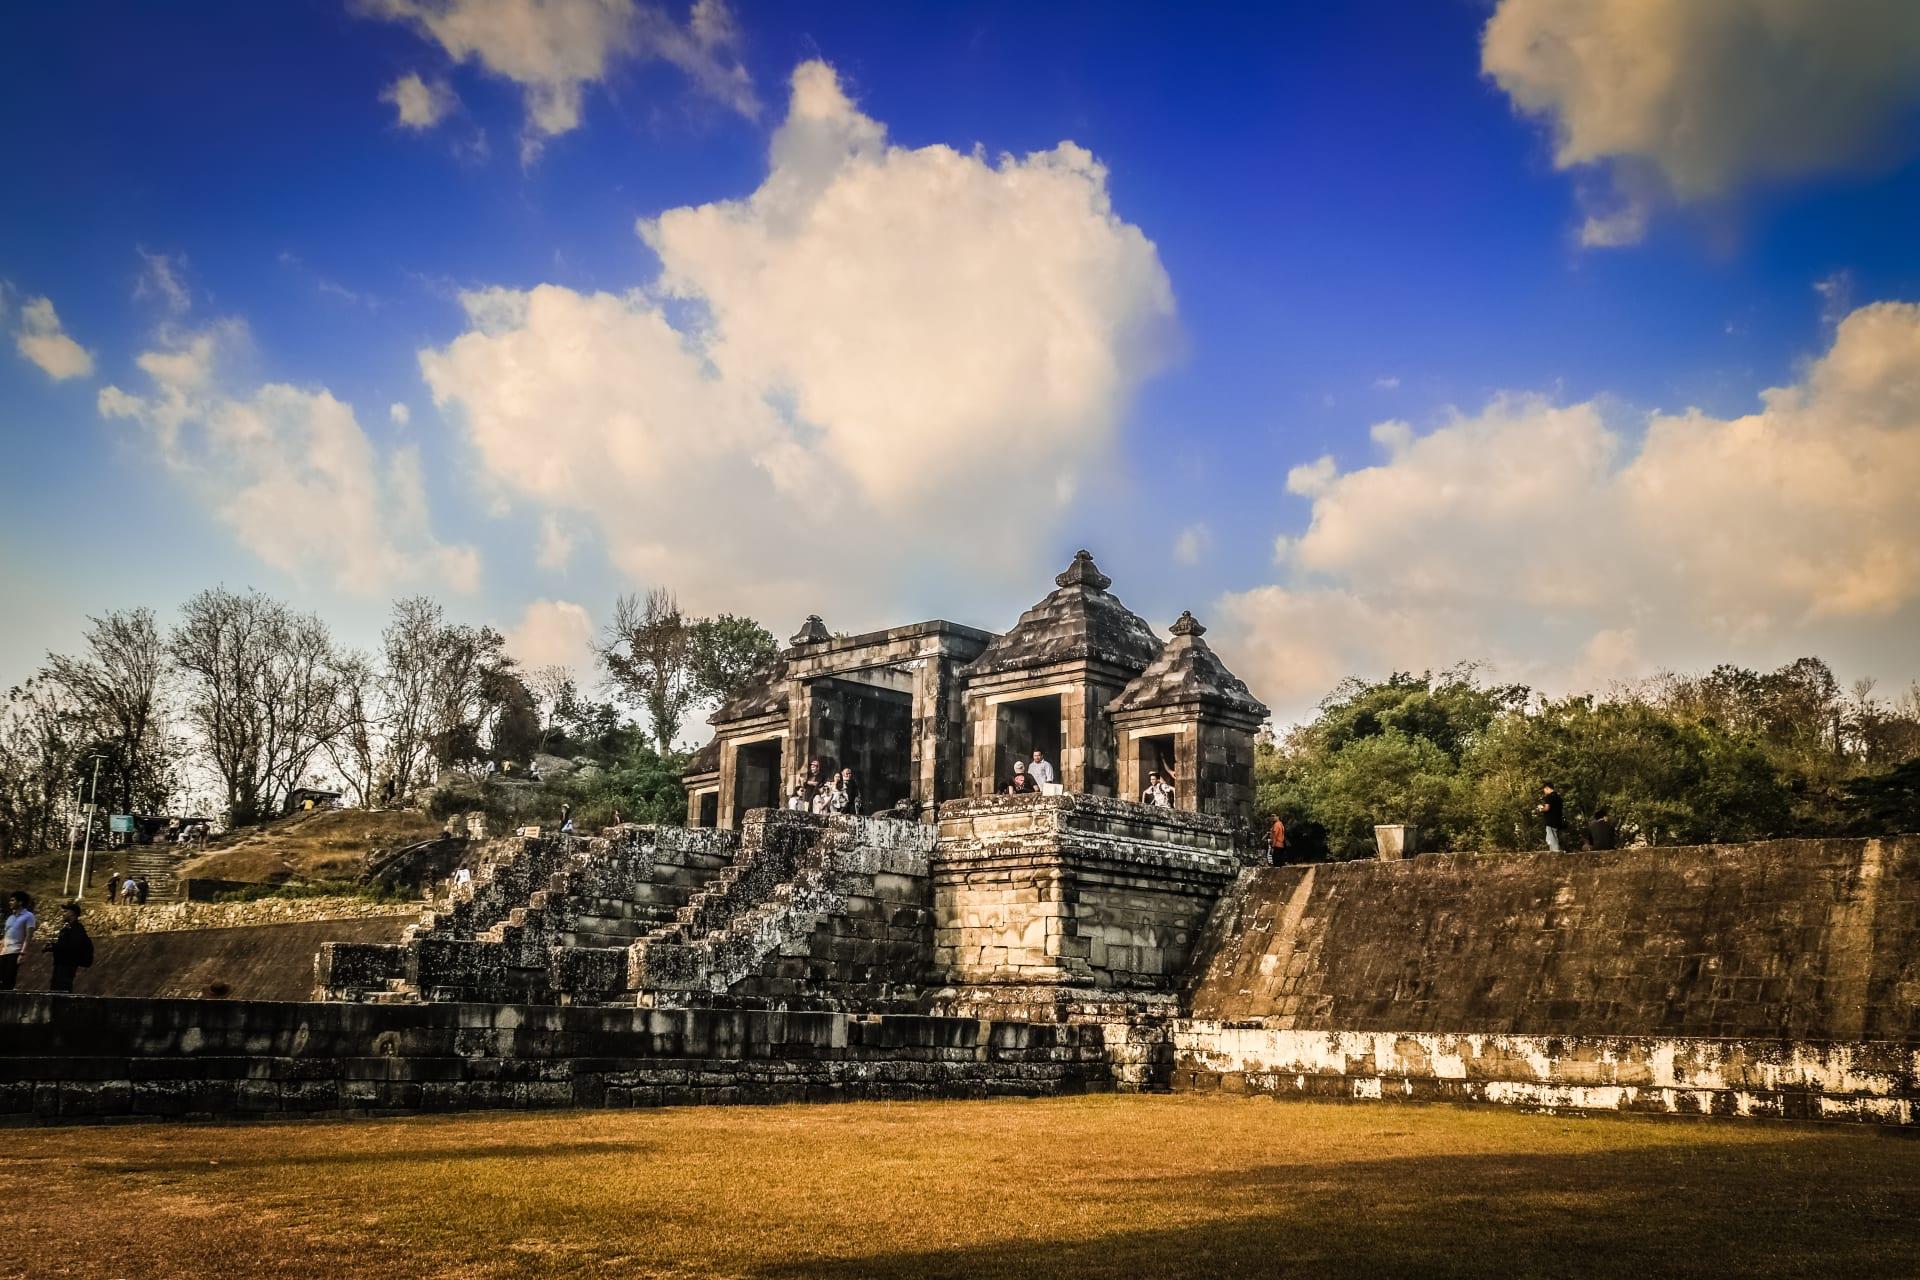 Yogyakarta - Mystery of Ratu Boko, the Palace of Ancient Mataram Kingdom